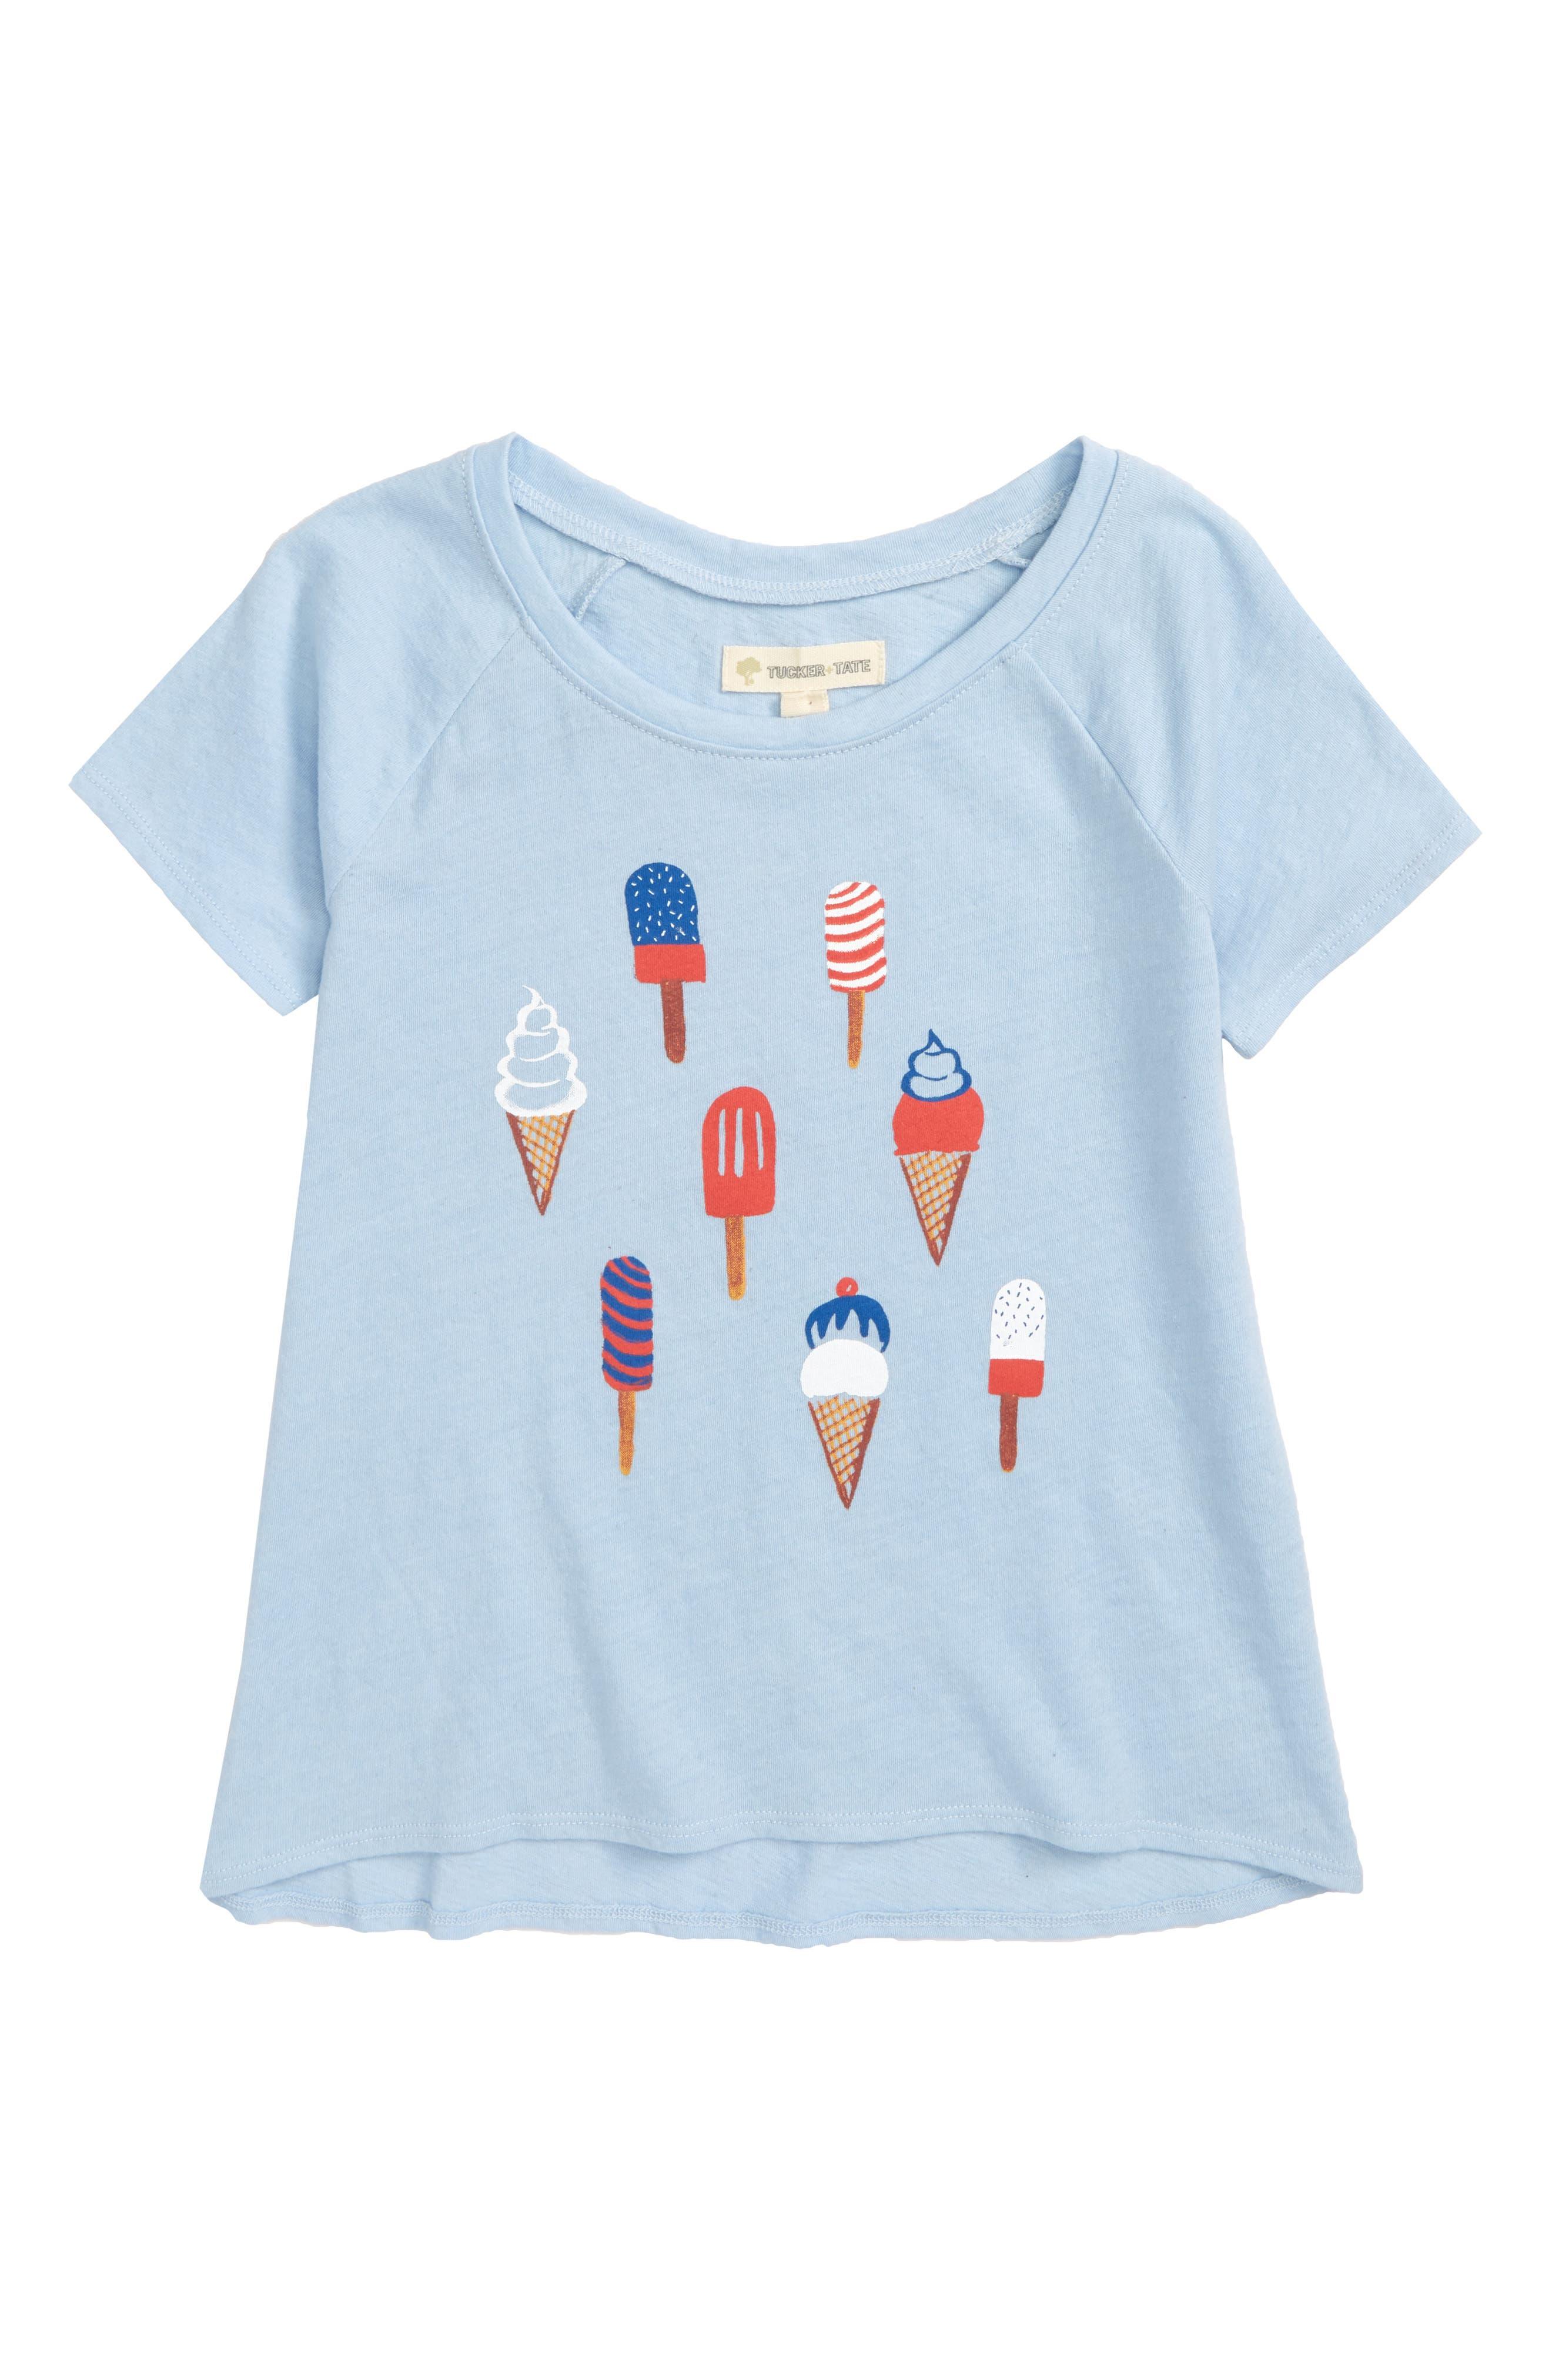 Graphic Tee,                         Main,                         color, Blue Thread Ice Cream